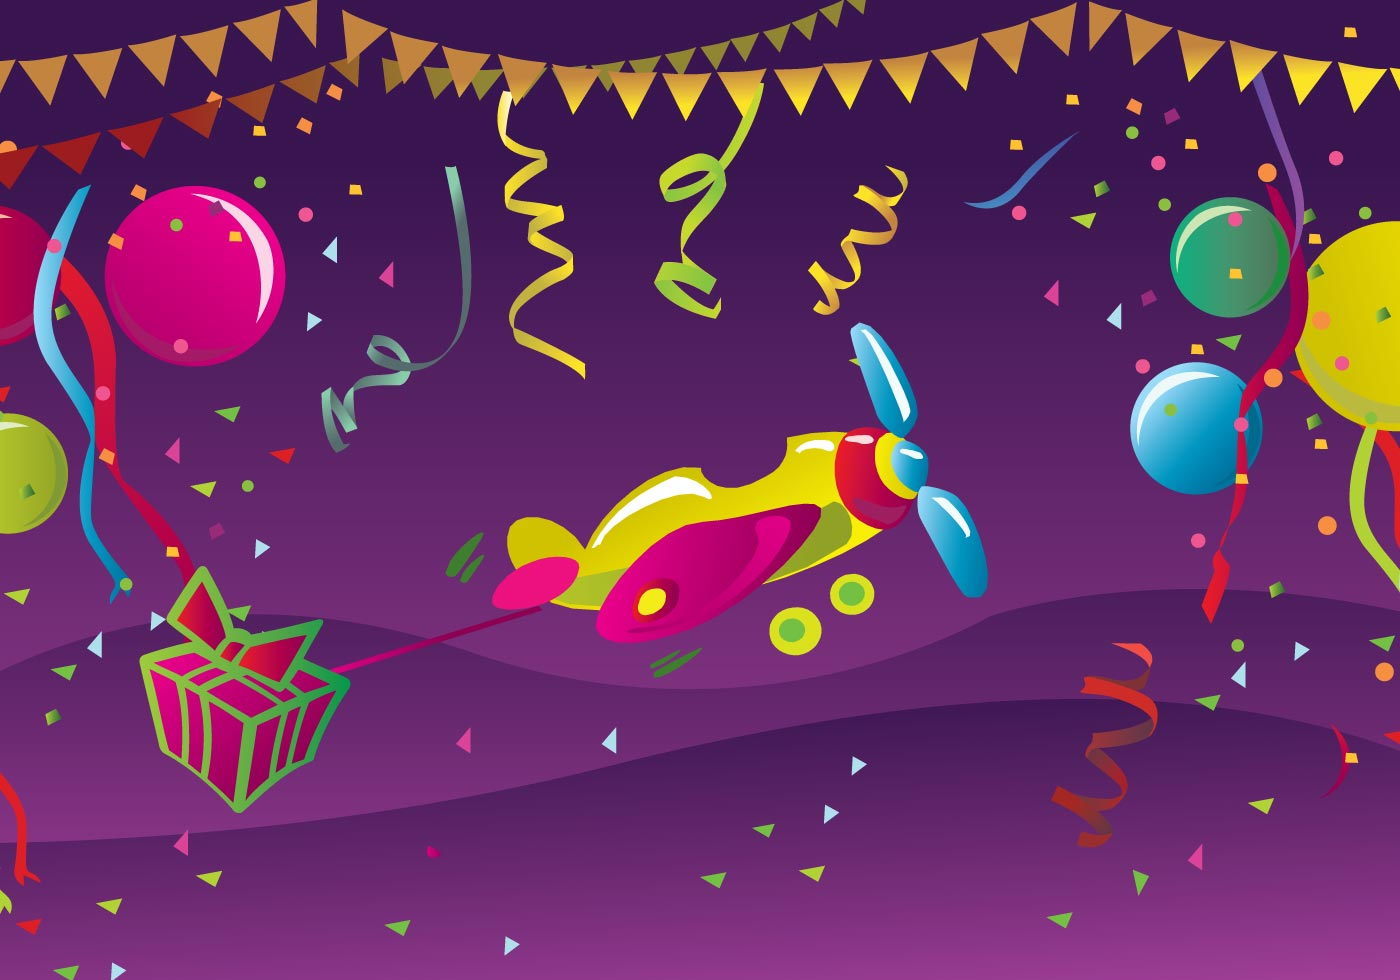 Happy Birthday Postcard - Download Free Vector Art, Stock ...